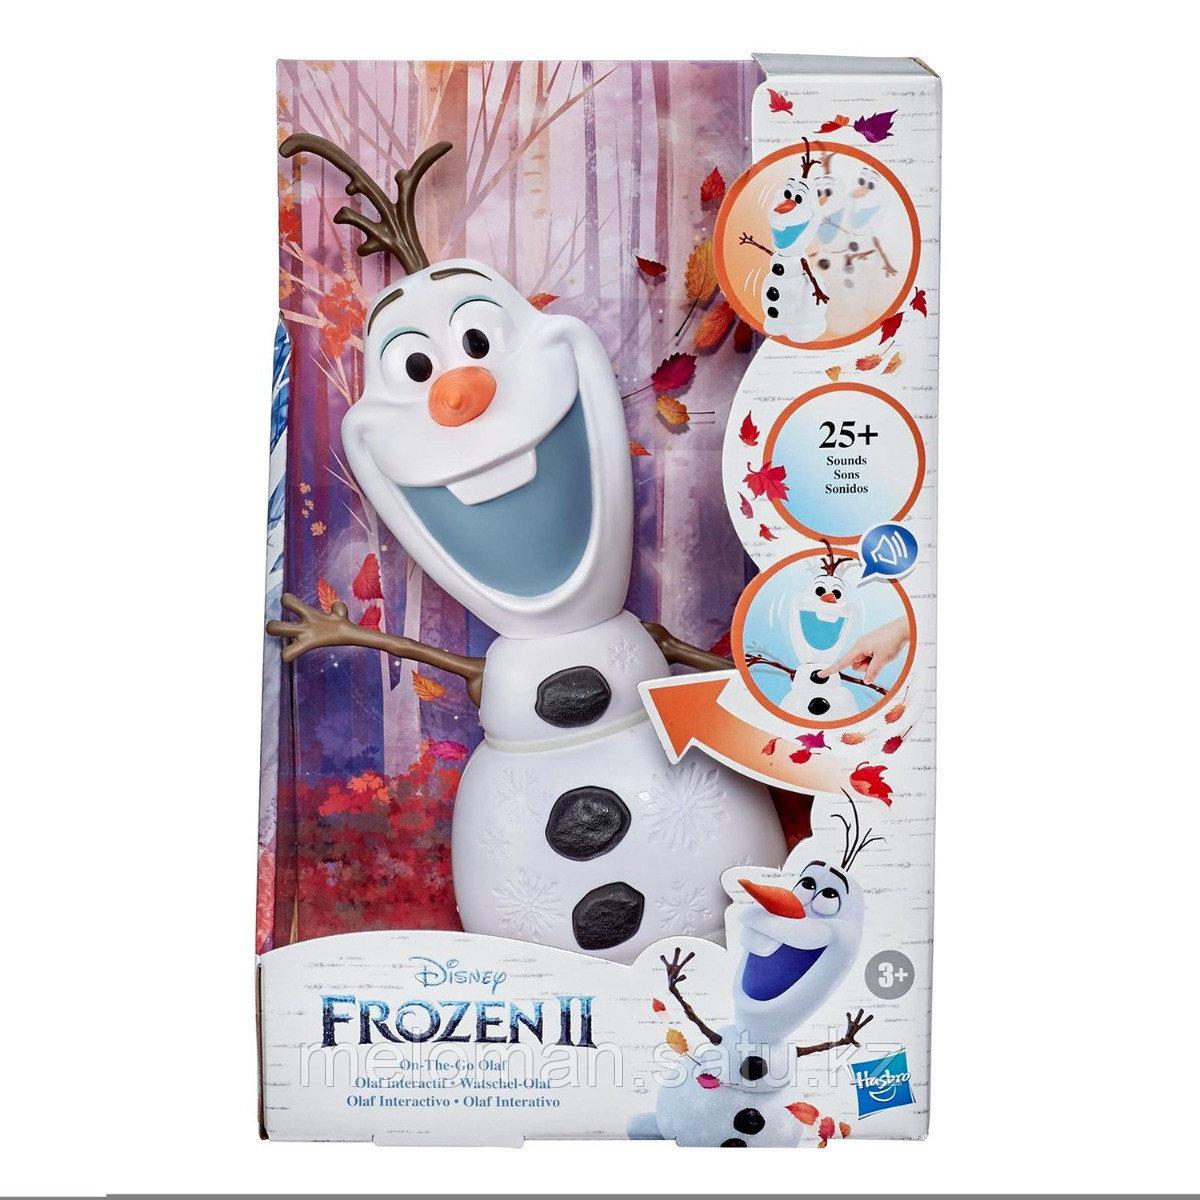 Disney Frozen: ИГРУШКА ХОЛОД СЕРД2 ИНТЕРАКТИВНЫЙ ОЛАФ - фото 4